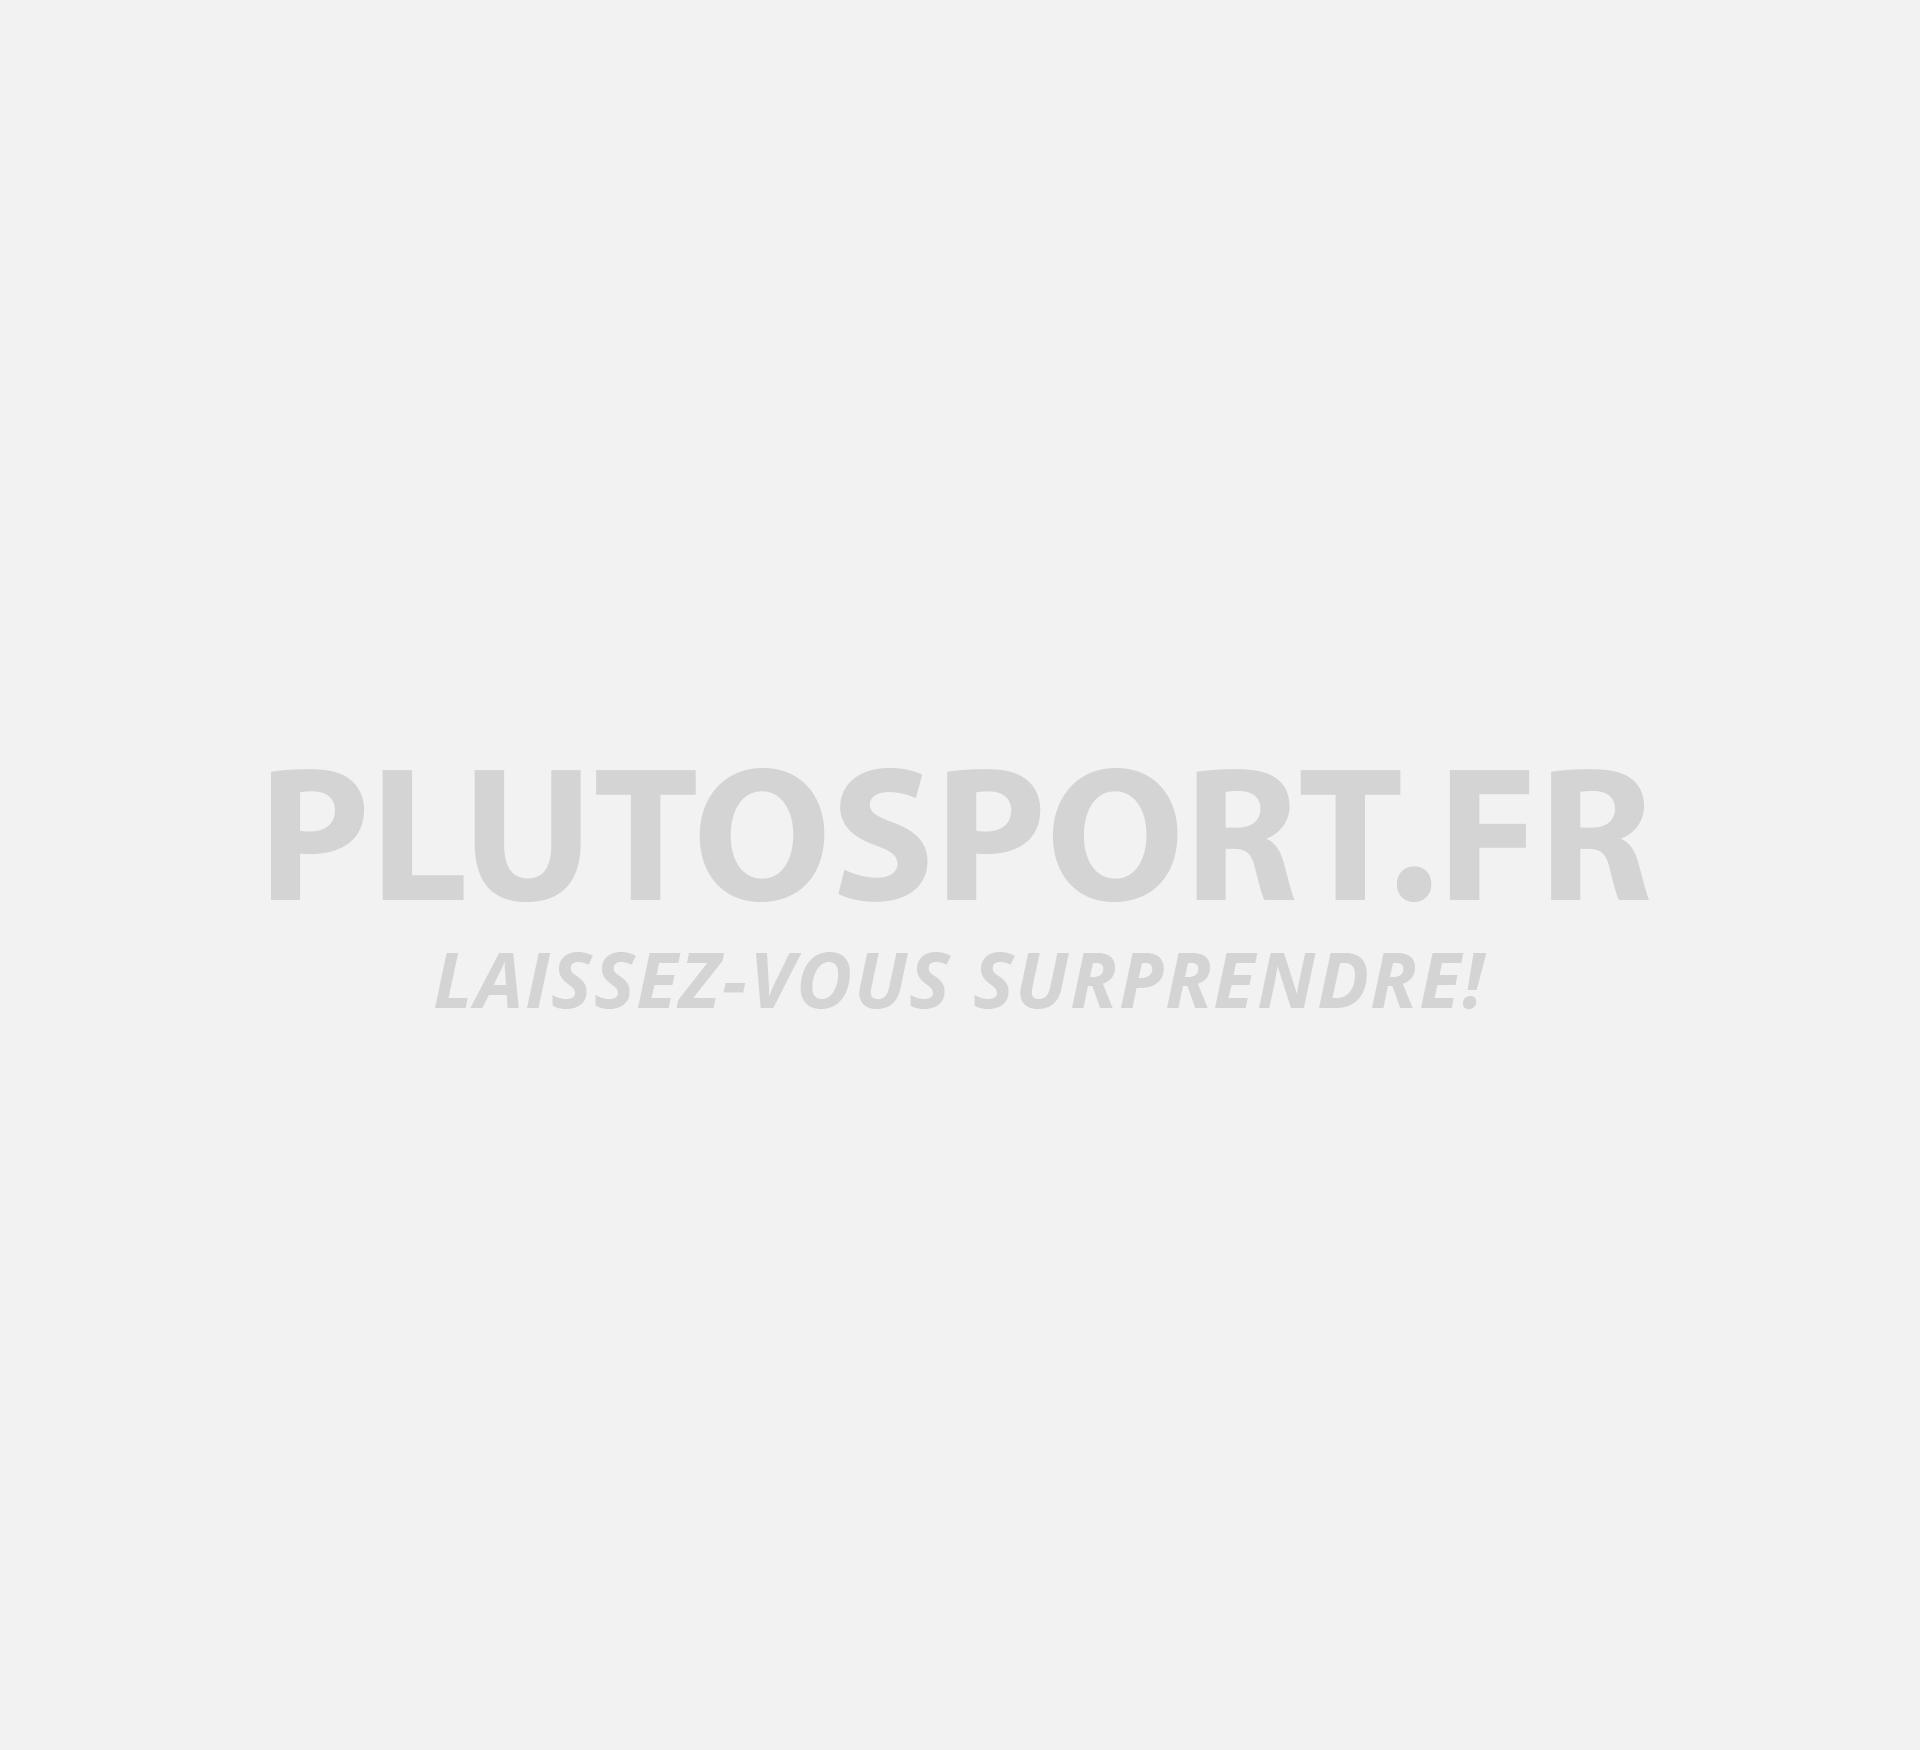 Lunettes de natation Speedo Futura Biofuse Comfort Flex